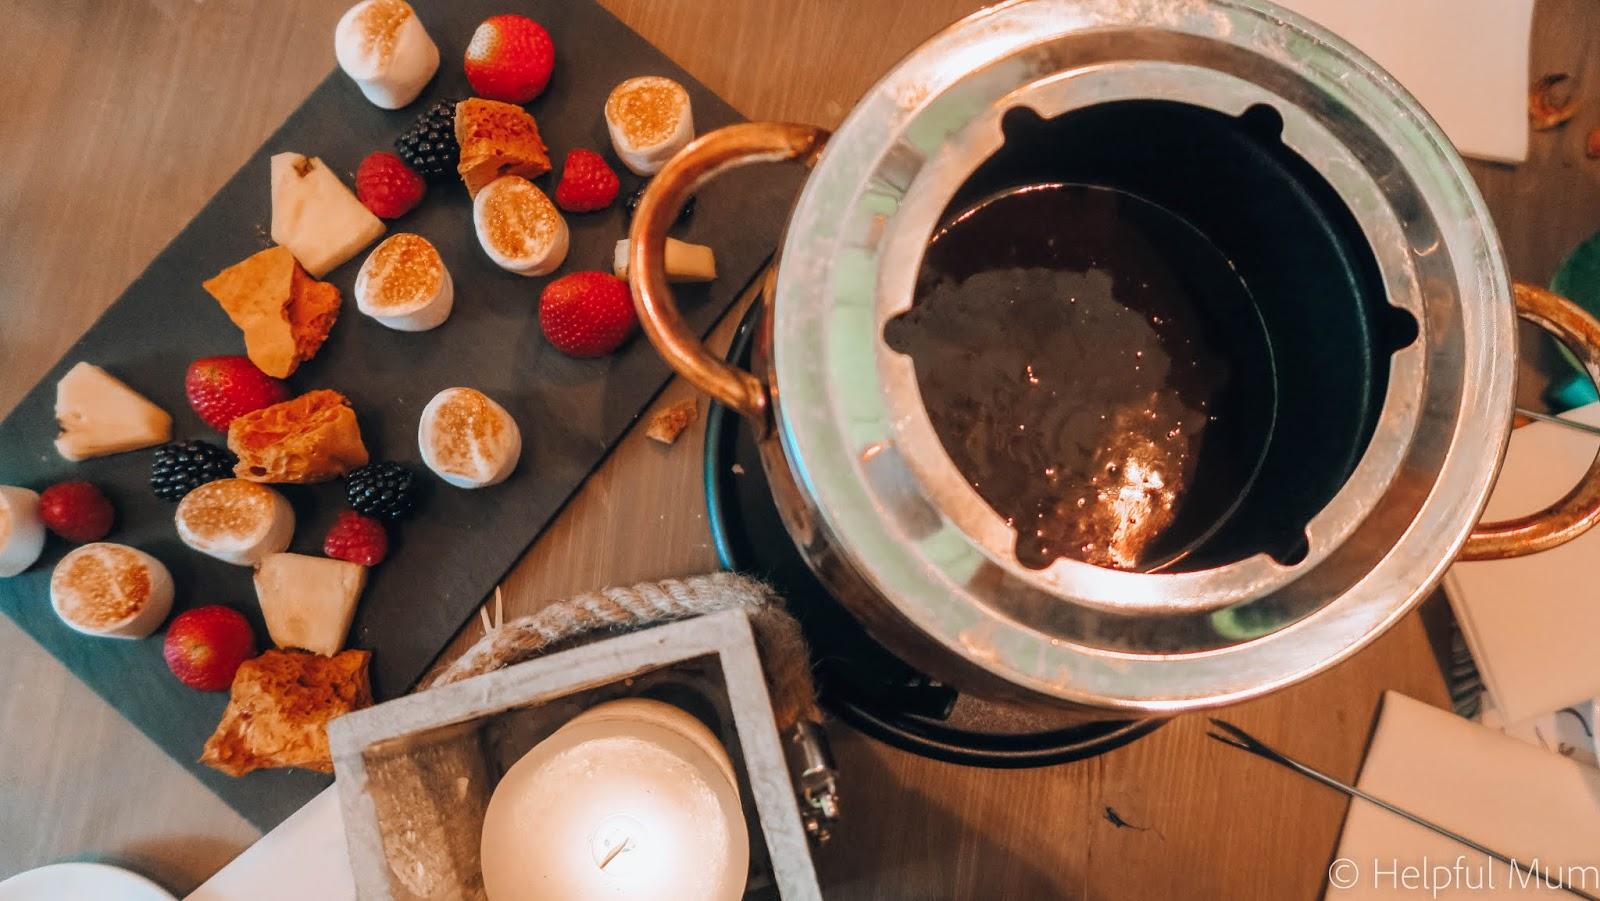 Alexander's chocolate fondue